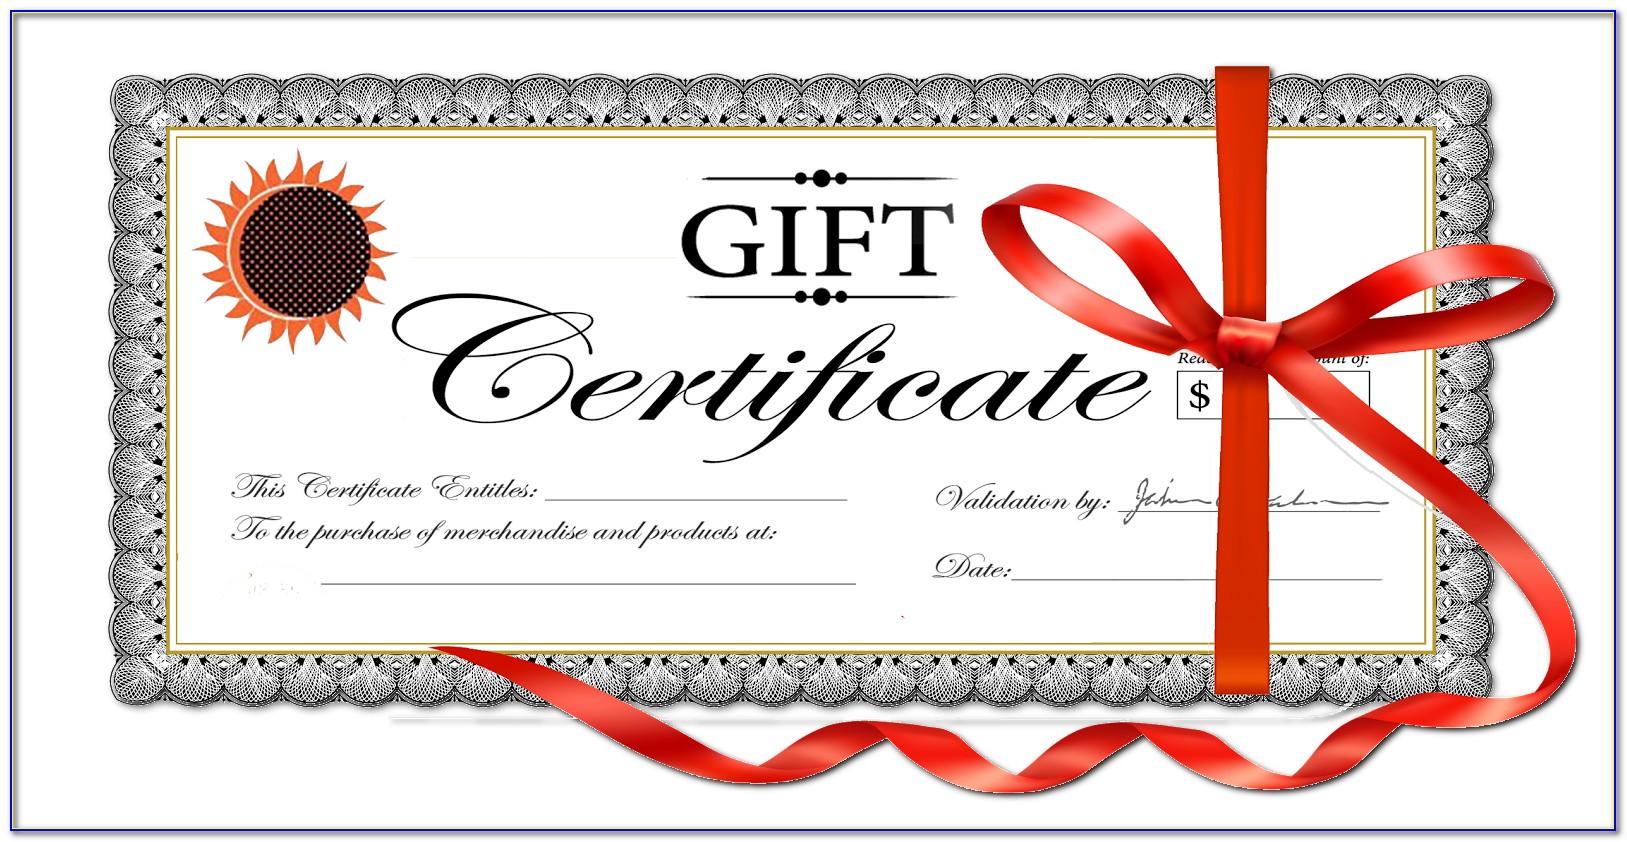 Graphic Design Gift Certificate Template